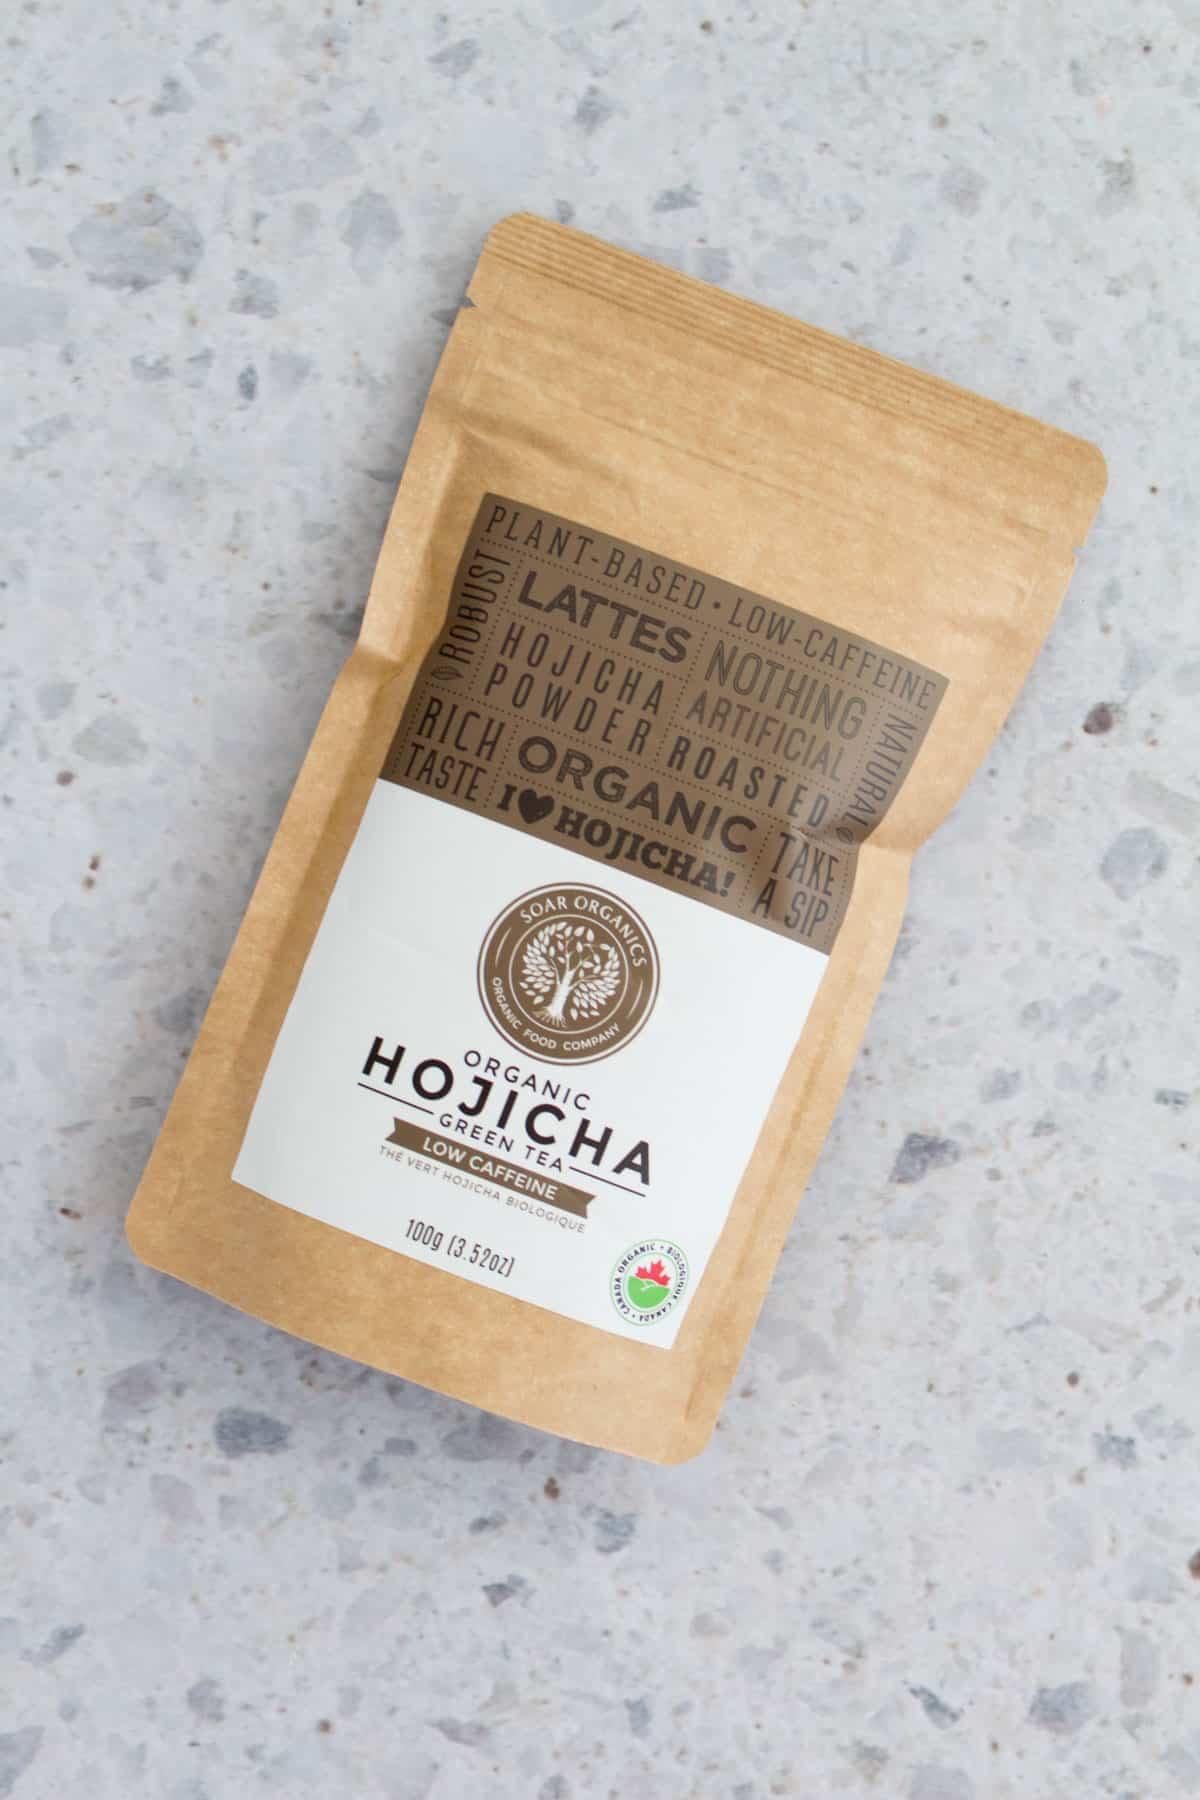 A bag of hojicha powder.